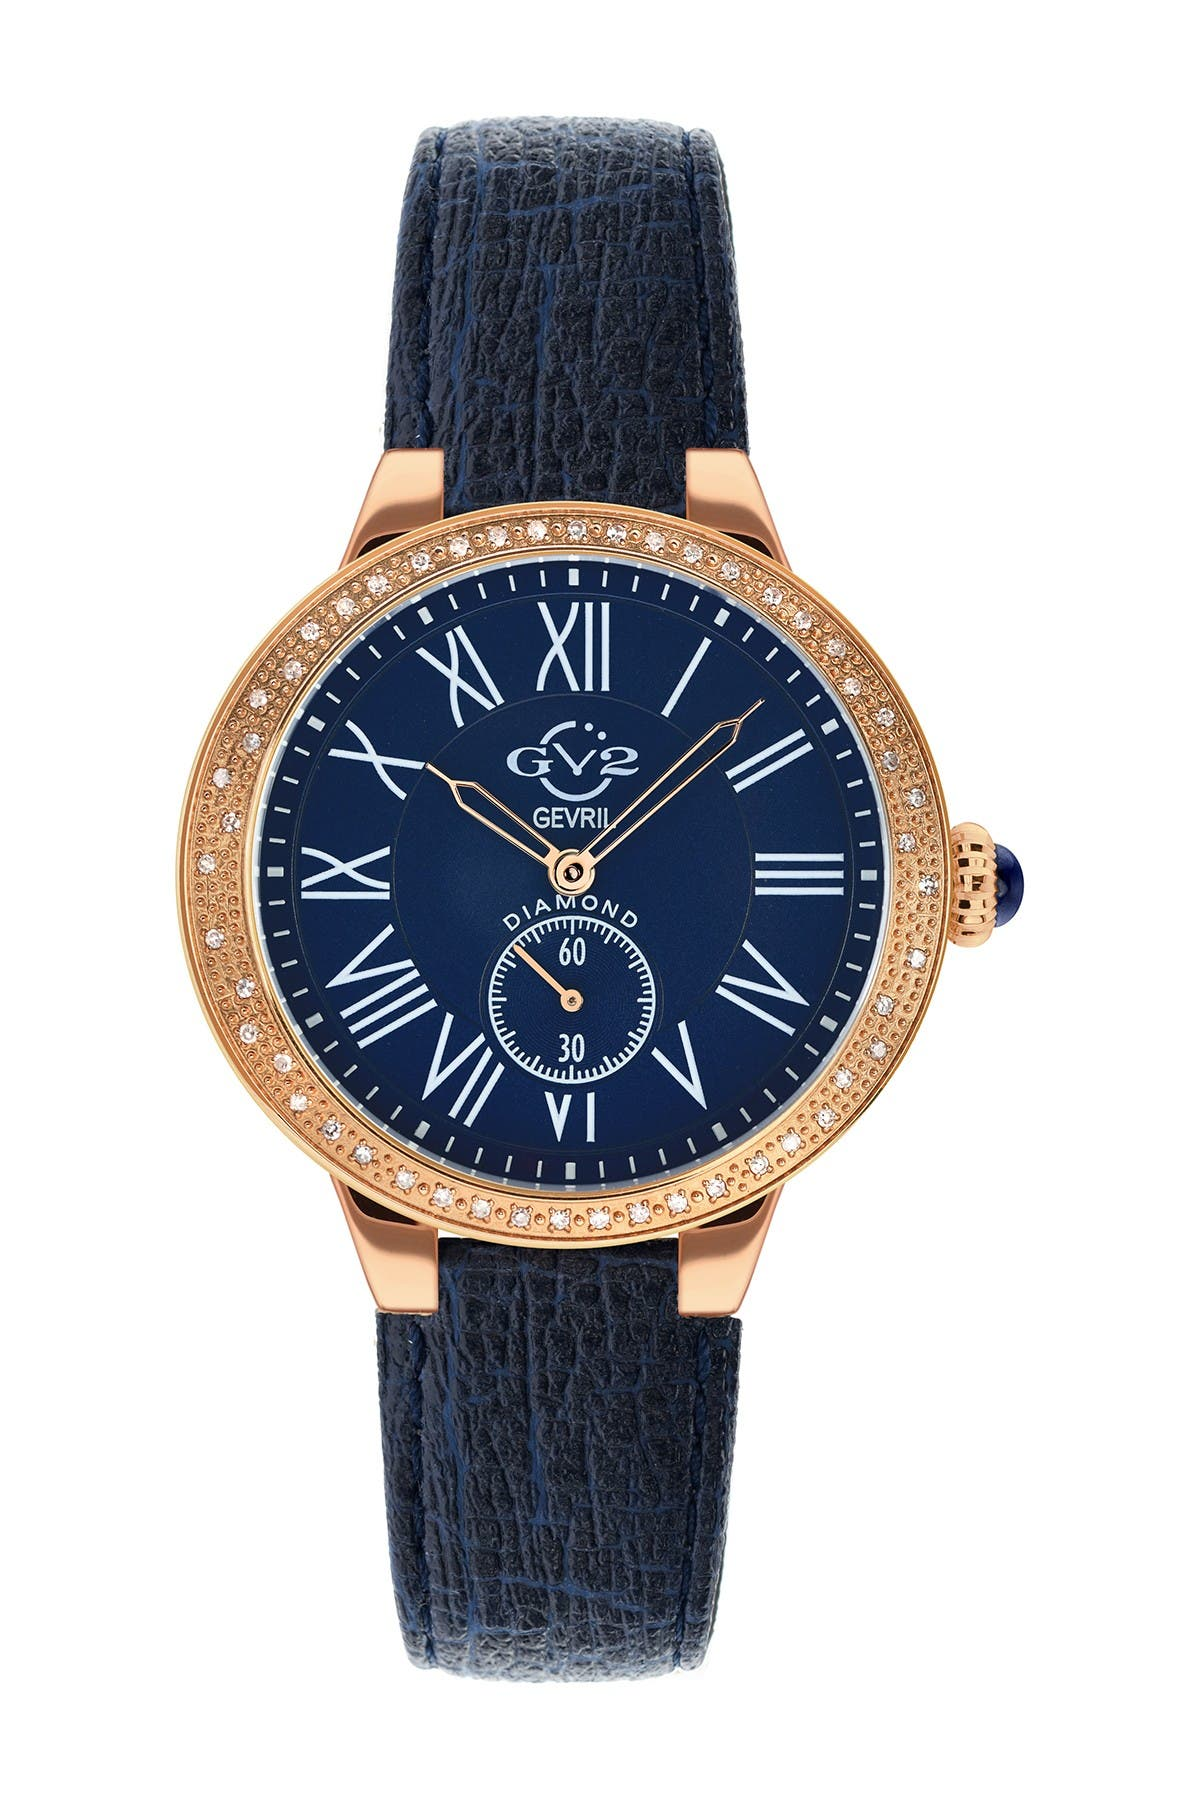 Image of Gevril Women's GV2 Astor Blue Vegan Strap Diamond Watch, 40mm - 0.28 ctw